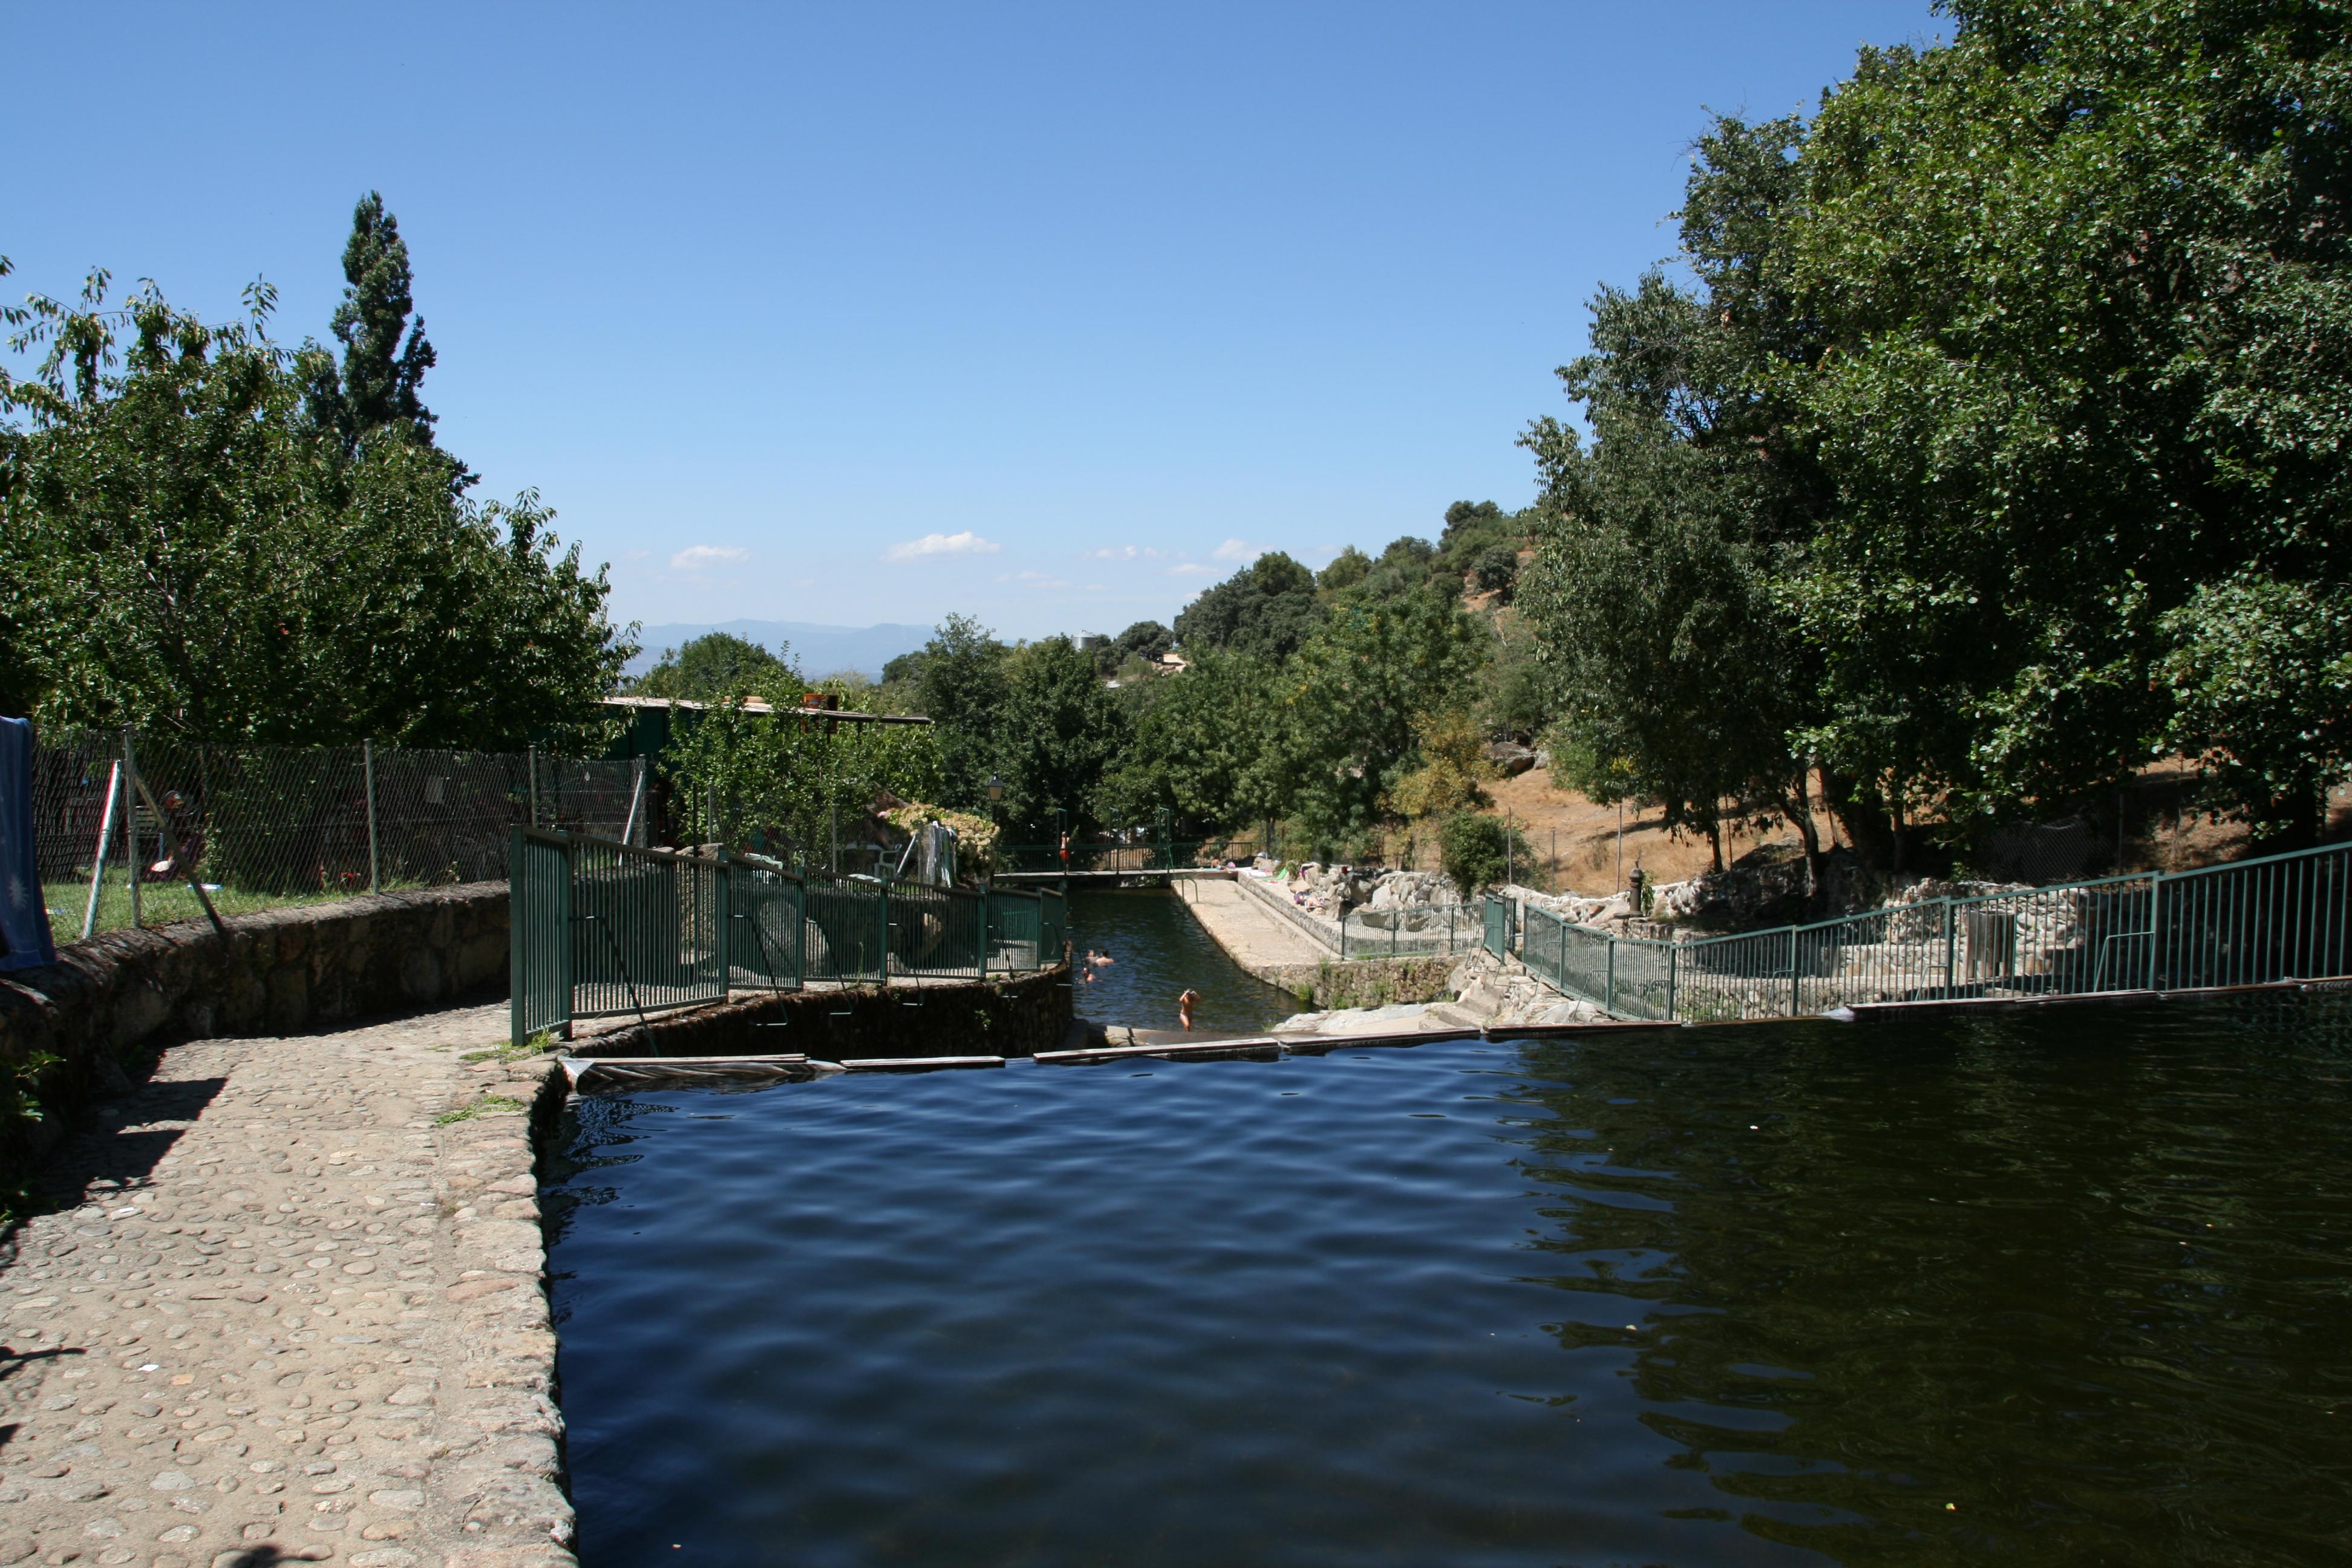 file piscinas naturales 10 de agosto de 2014 segura de